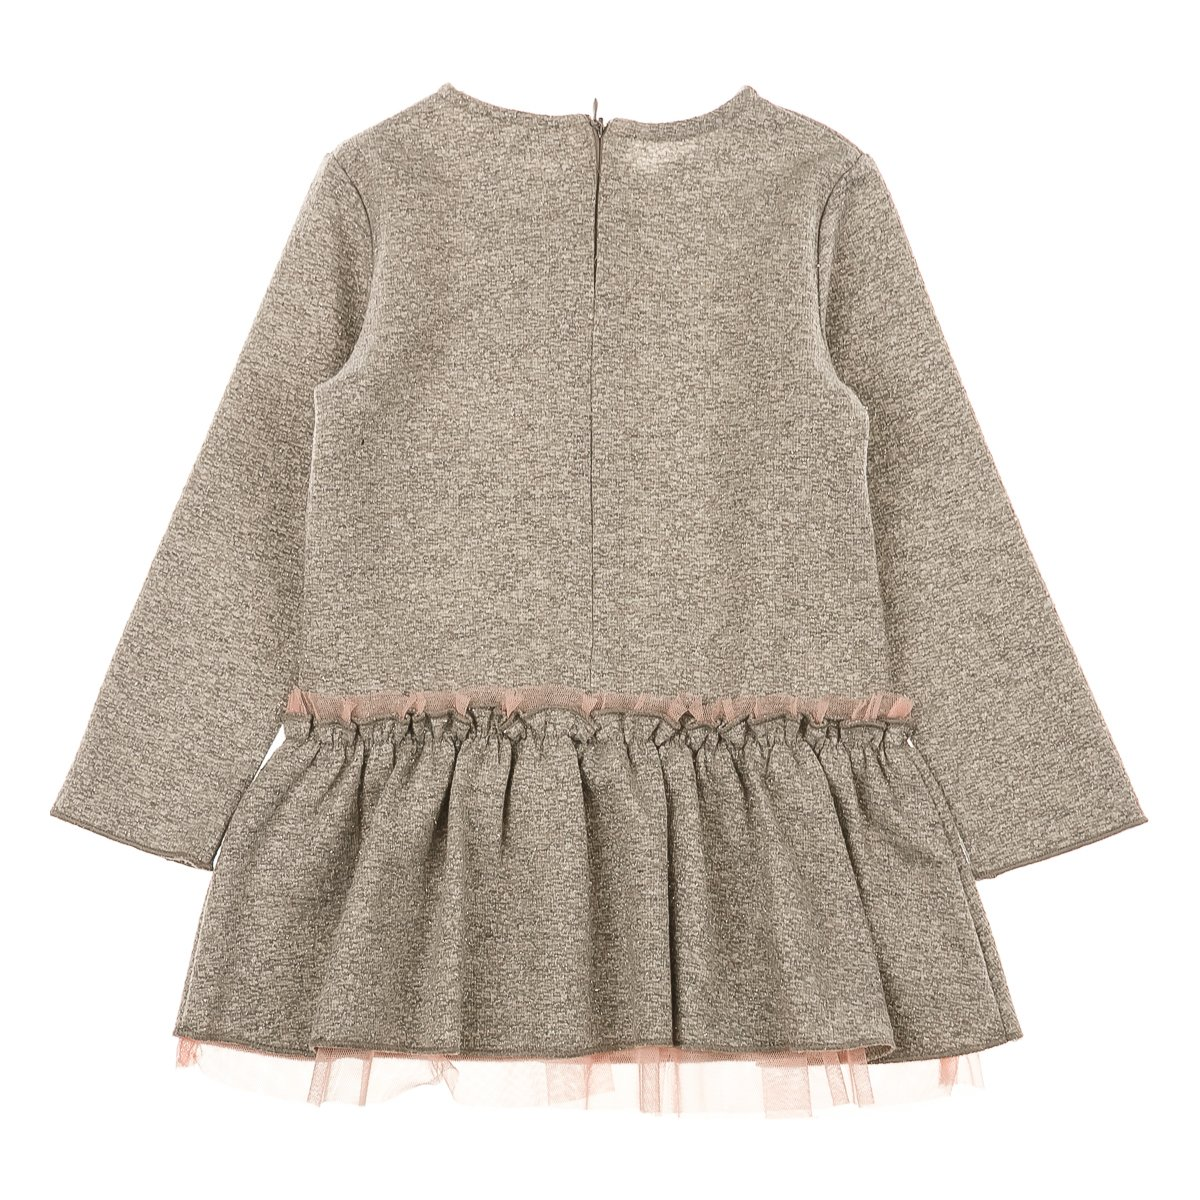 Купить Платья, сарафаны, юбки, Платье BluKids Love&Flowers, р. 92 5479458 ТМ: BluKids, серый